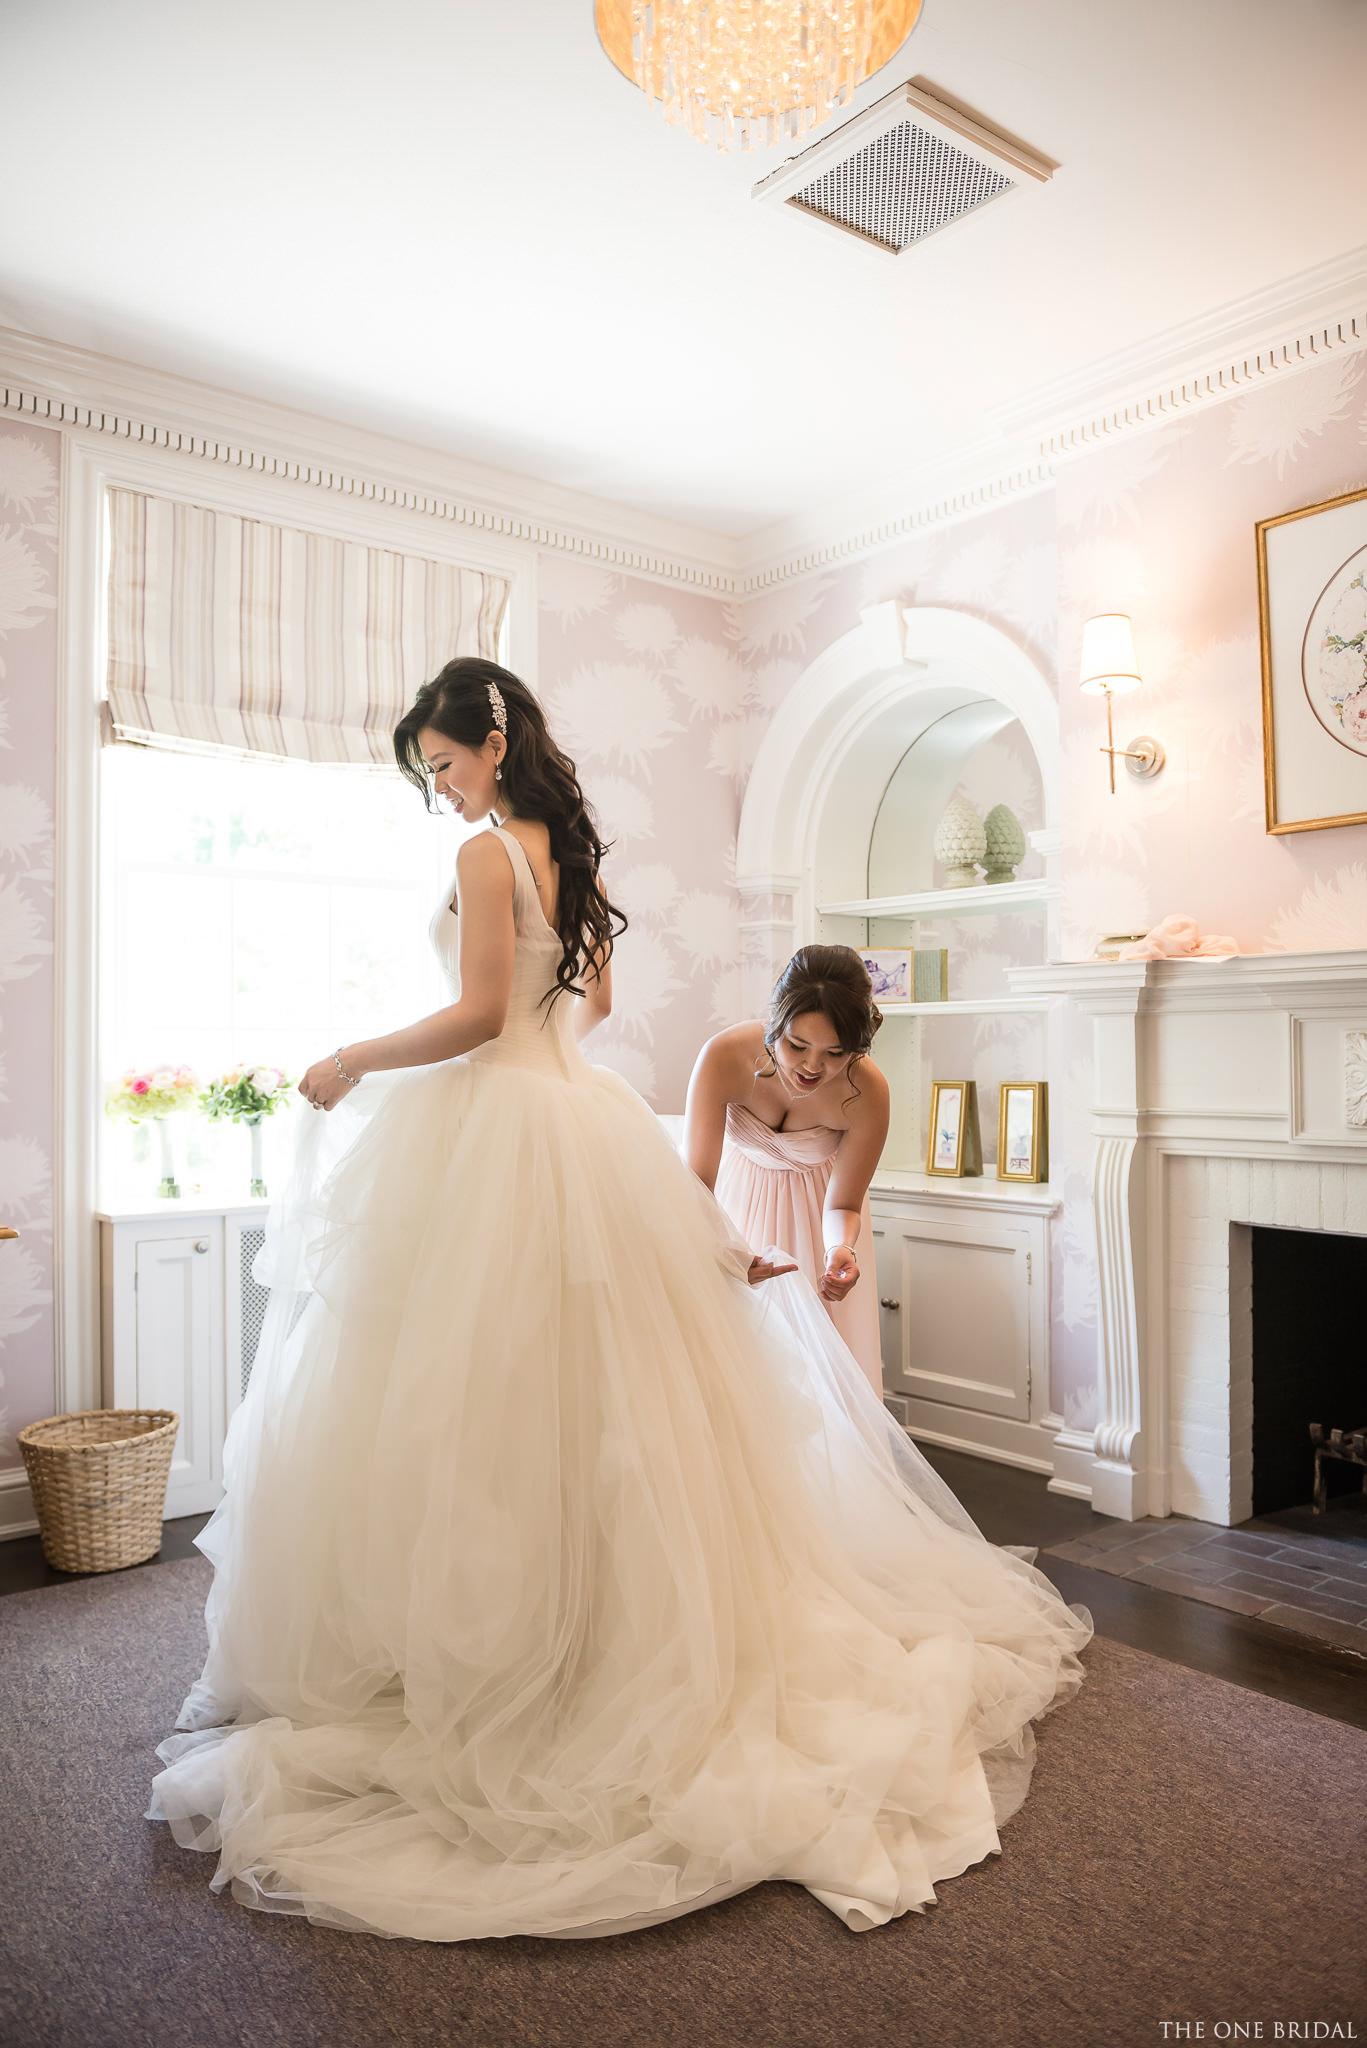 estates-of-sunnybrook-mclean-house-wedding-the-one-bridal-15